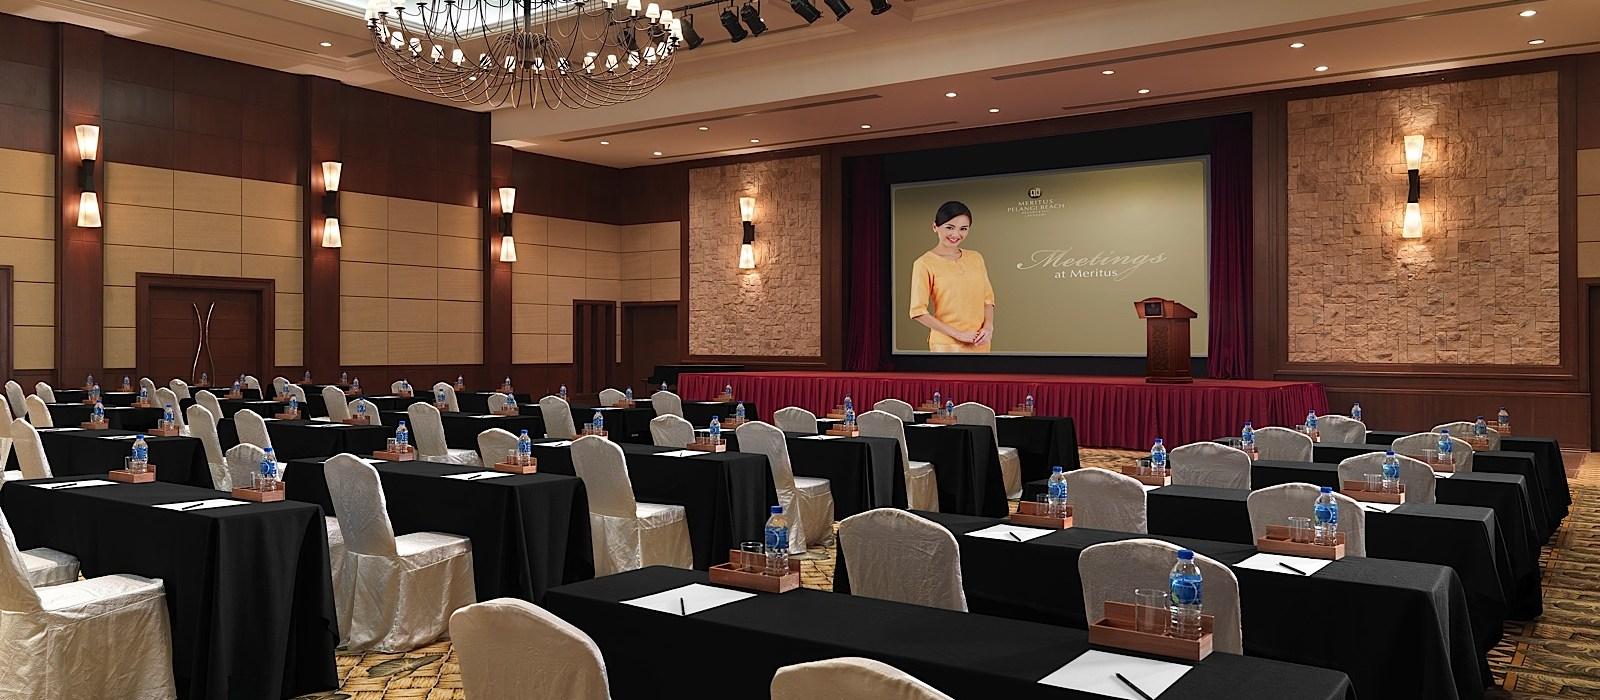 http://pacis2017.my-ais.org/wp-content/uploads/2016/12/Meeting_Setup1.jpg